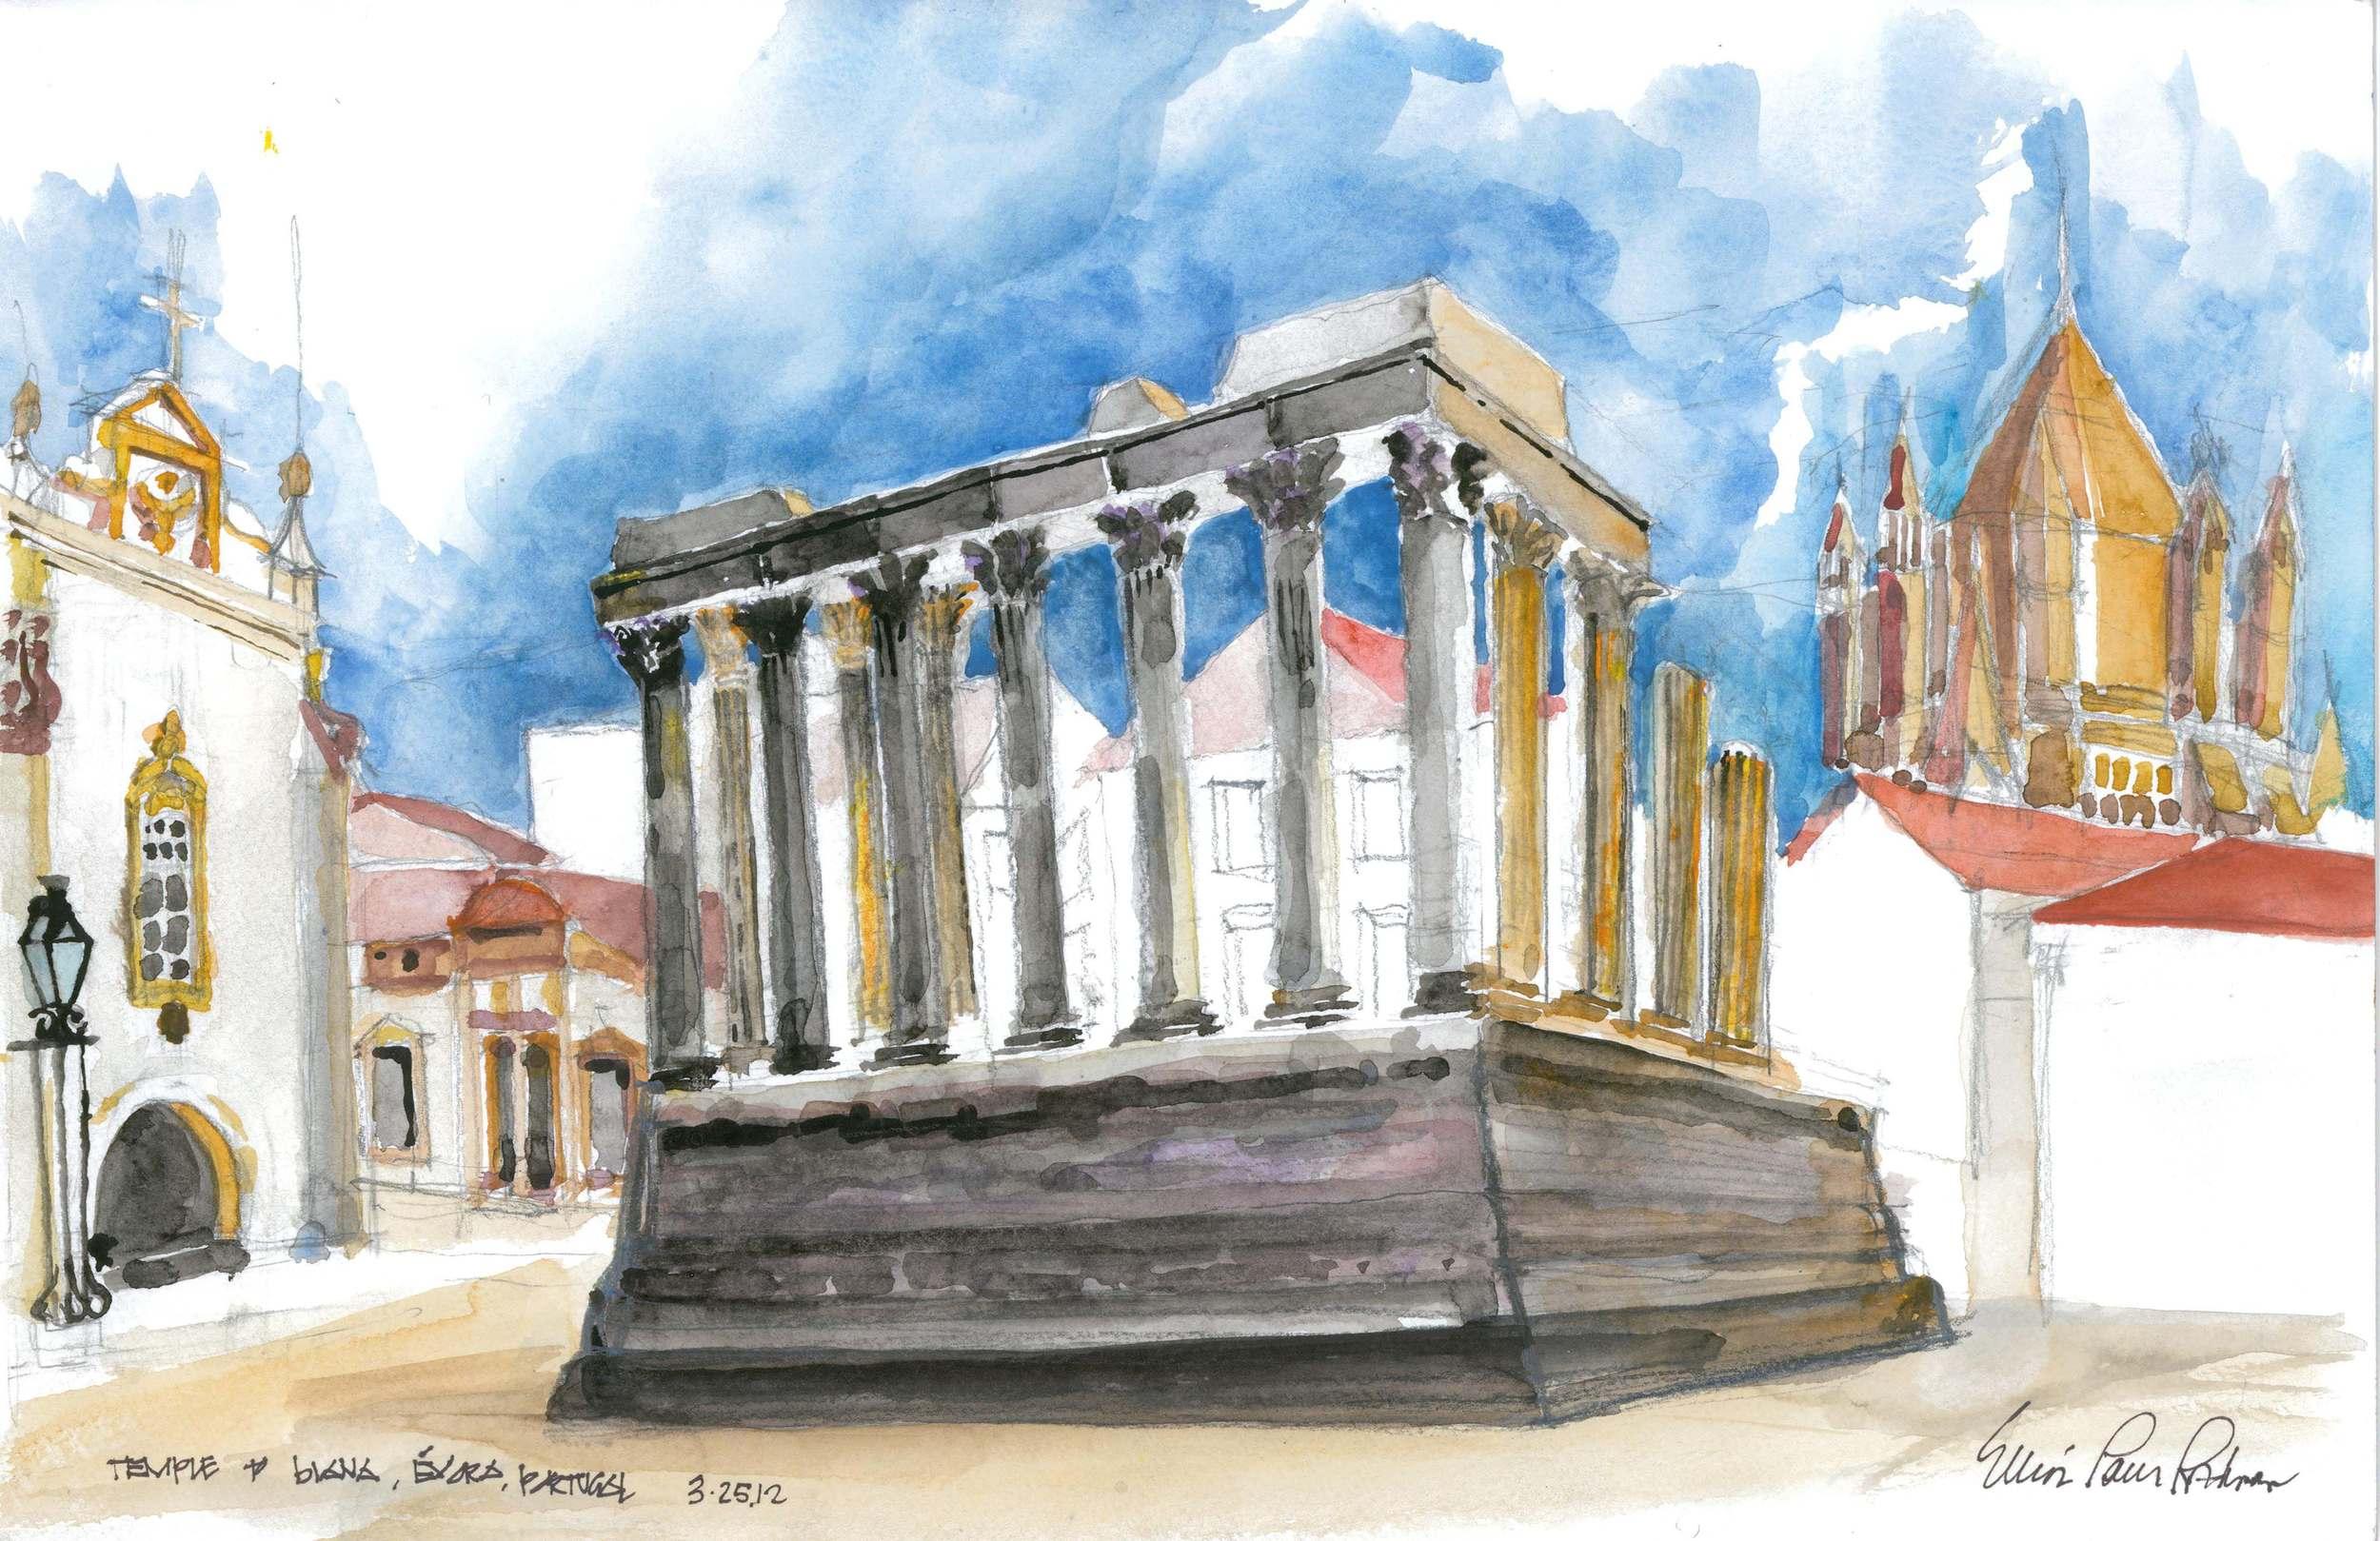 Temple of Diana Evora